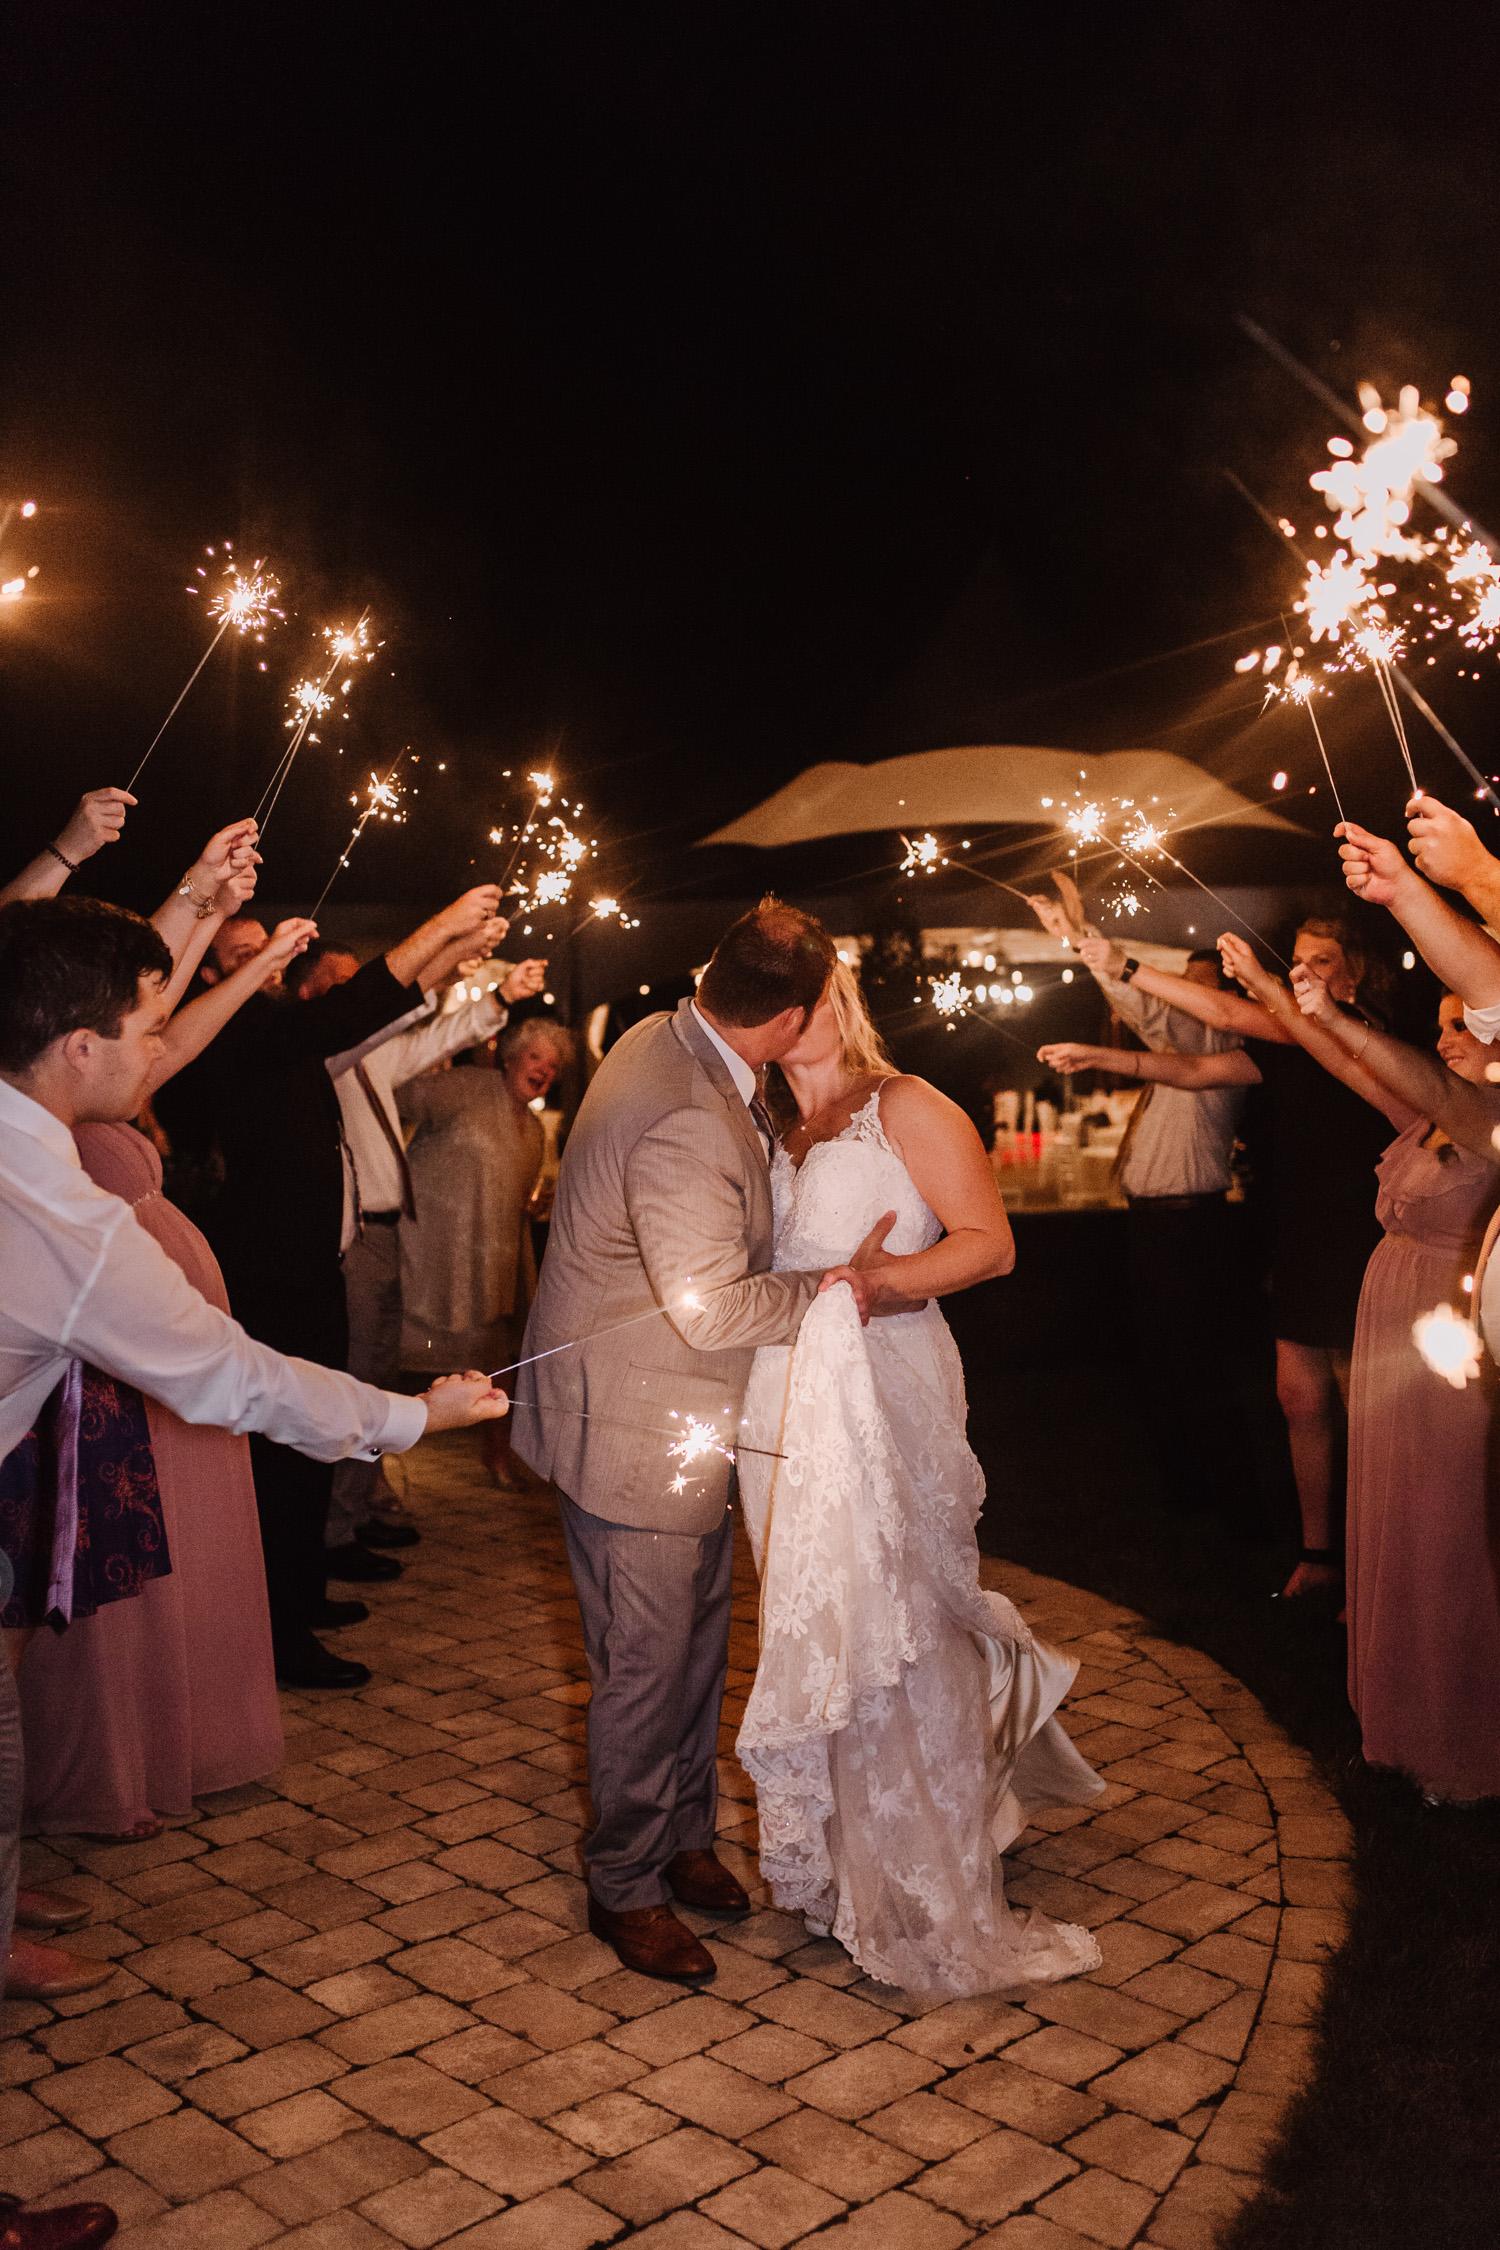 Wedding Reception details by Kayli LaFon Photography | Greensboro Winston-Salem, NC Wedding Photographer | The Hideaway at Crooked Creek, Whitsett